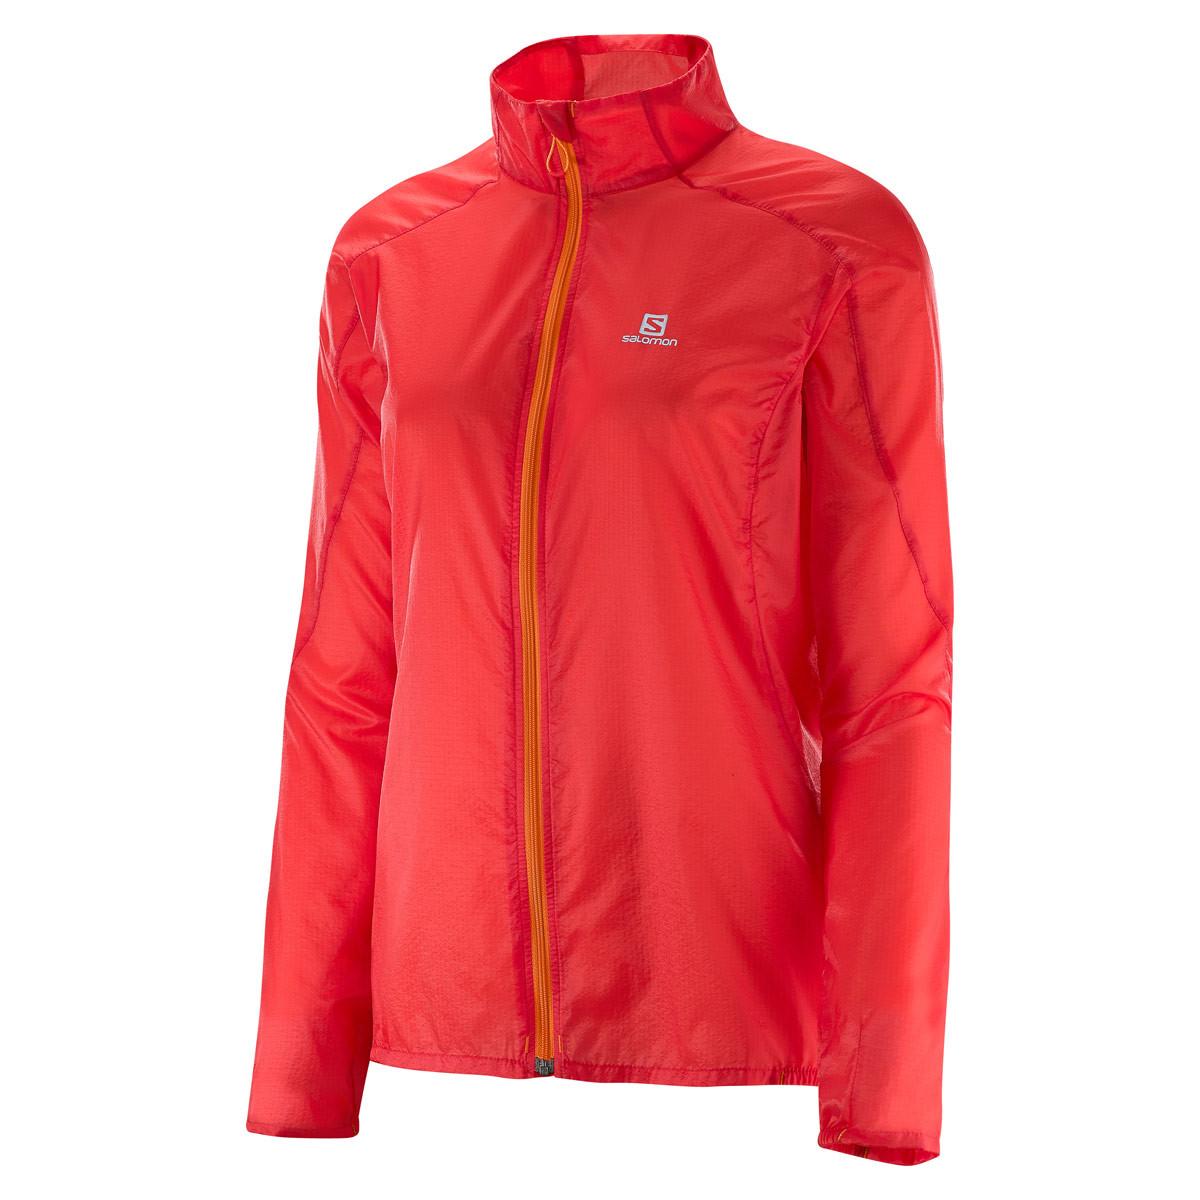 Wing Para Mujer Rojo Fast Running Chaquetas De Jacket Salomon qwaWUx5RFa